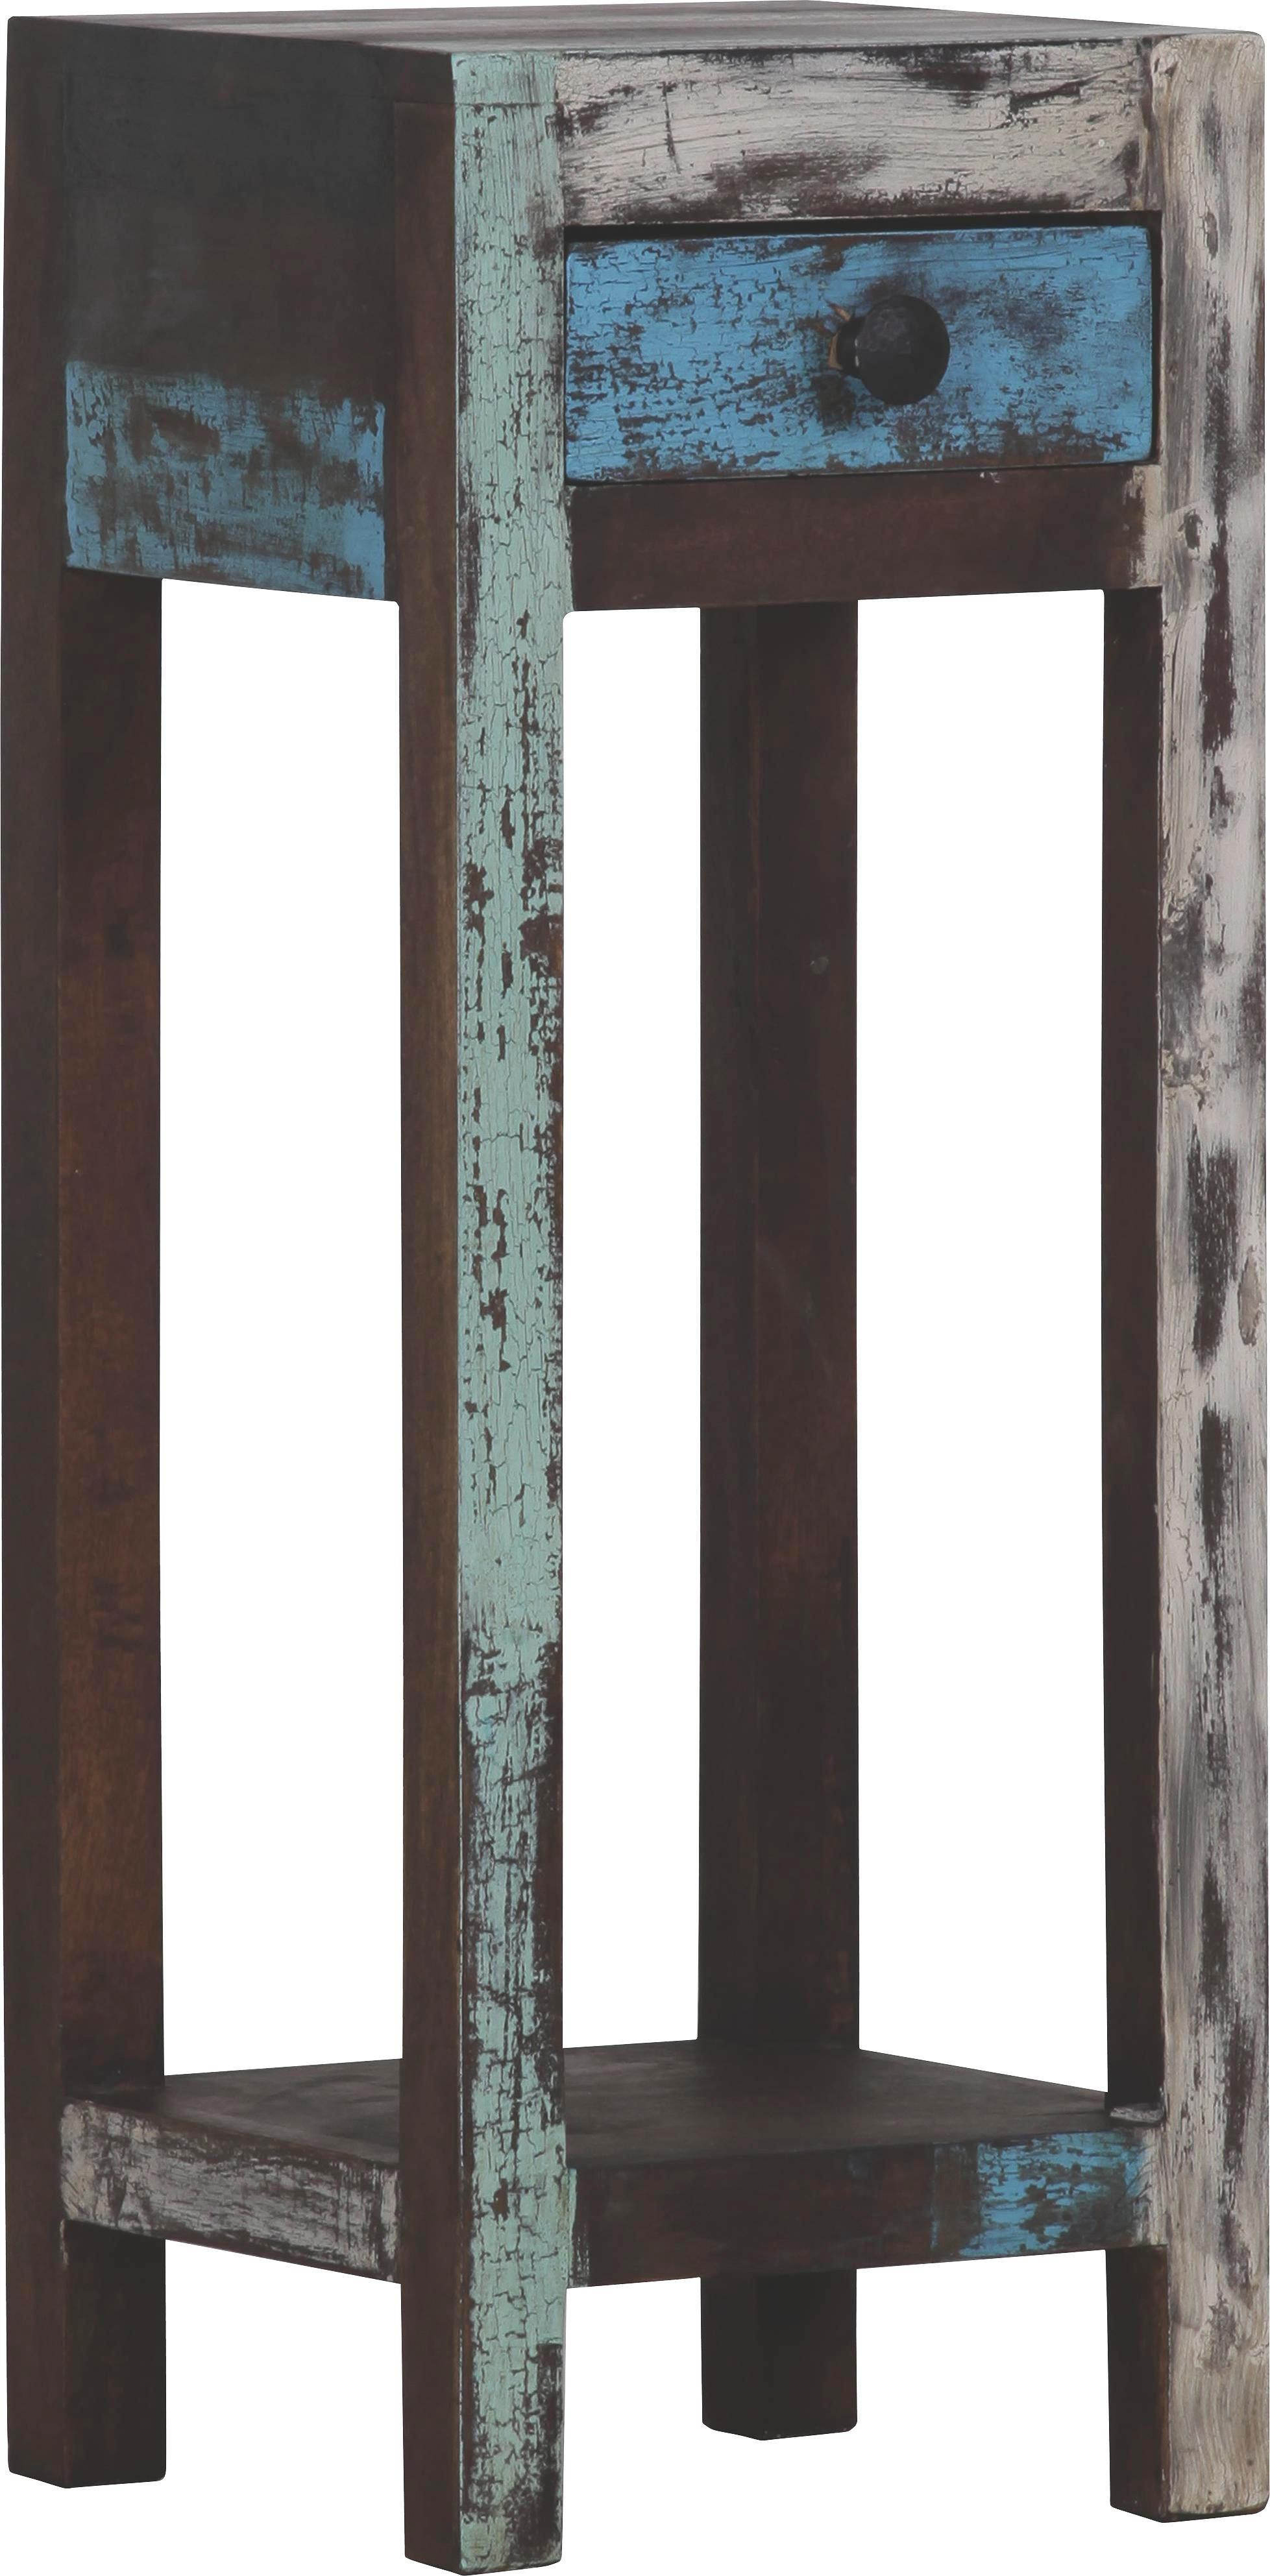 BEISTELLTISCH Mangoholz massiv Multicolor - Multicolor, MODERN, Holz (30/80/30cm) - LANDSCAPE